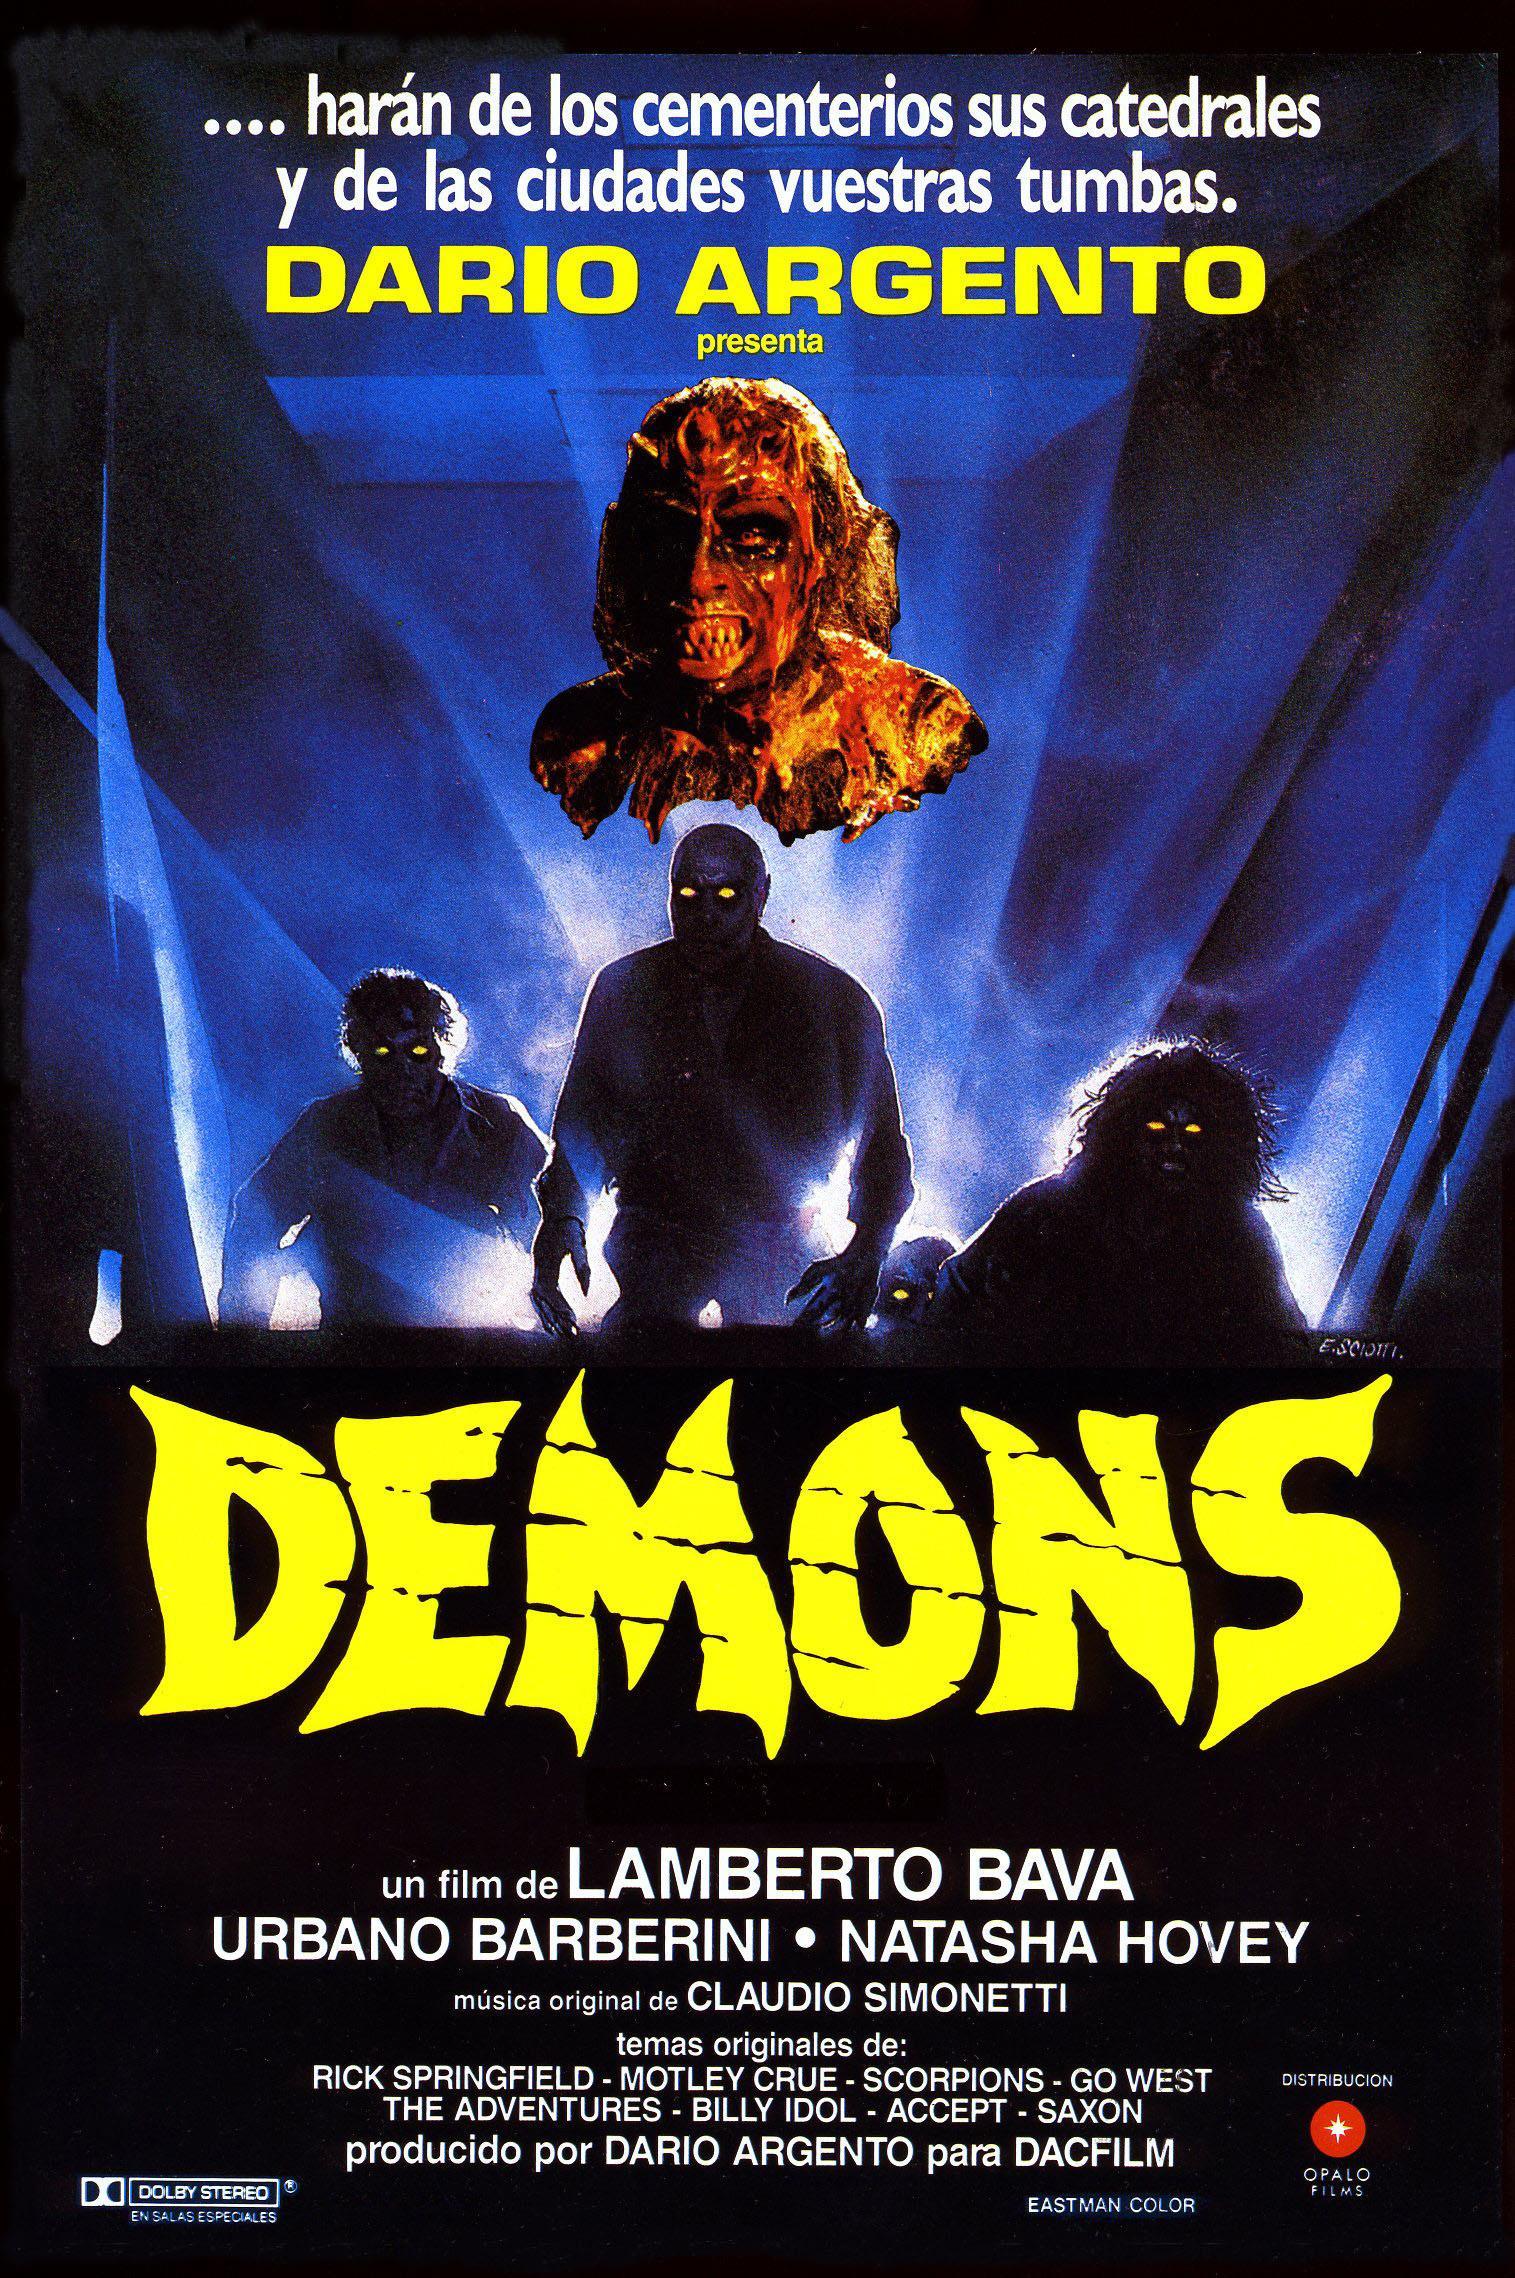 Cartel de la pelicula Demons